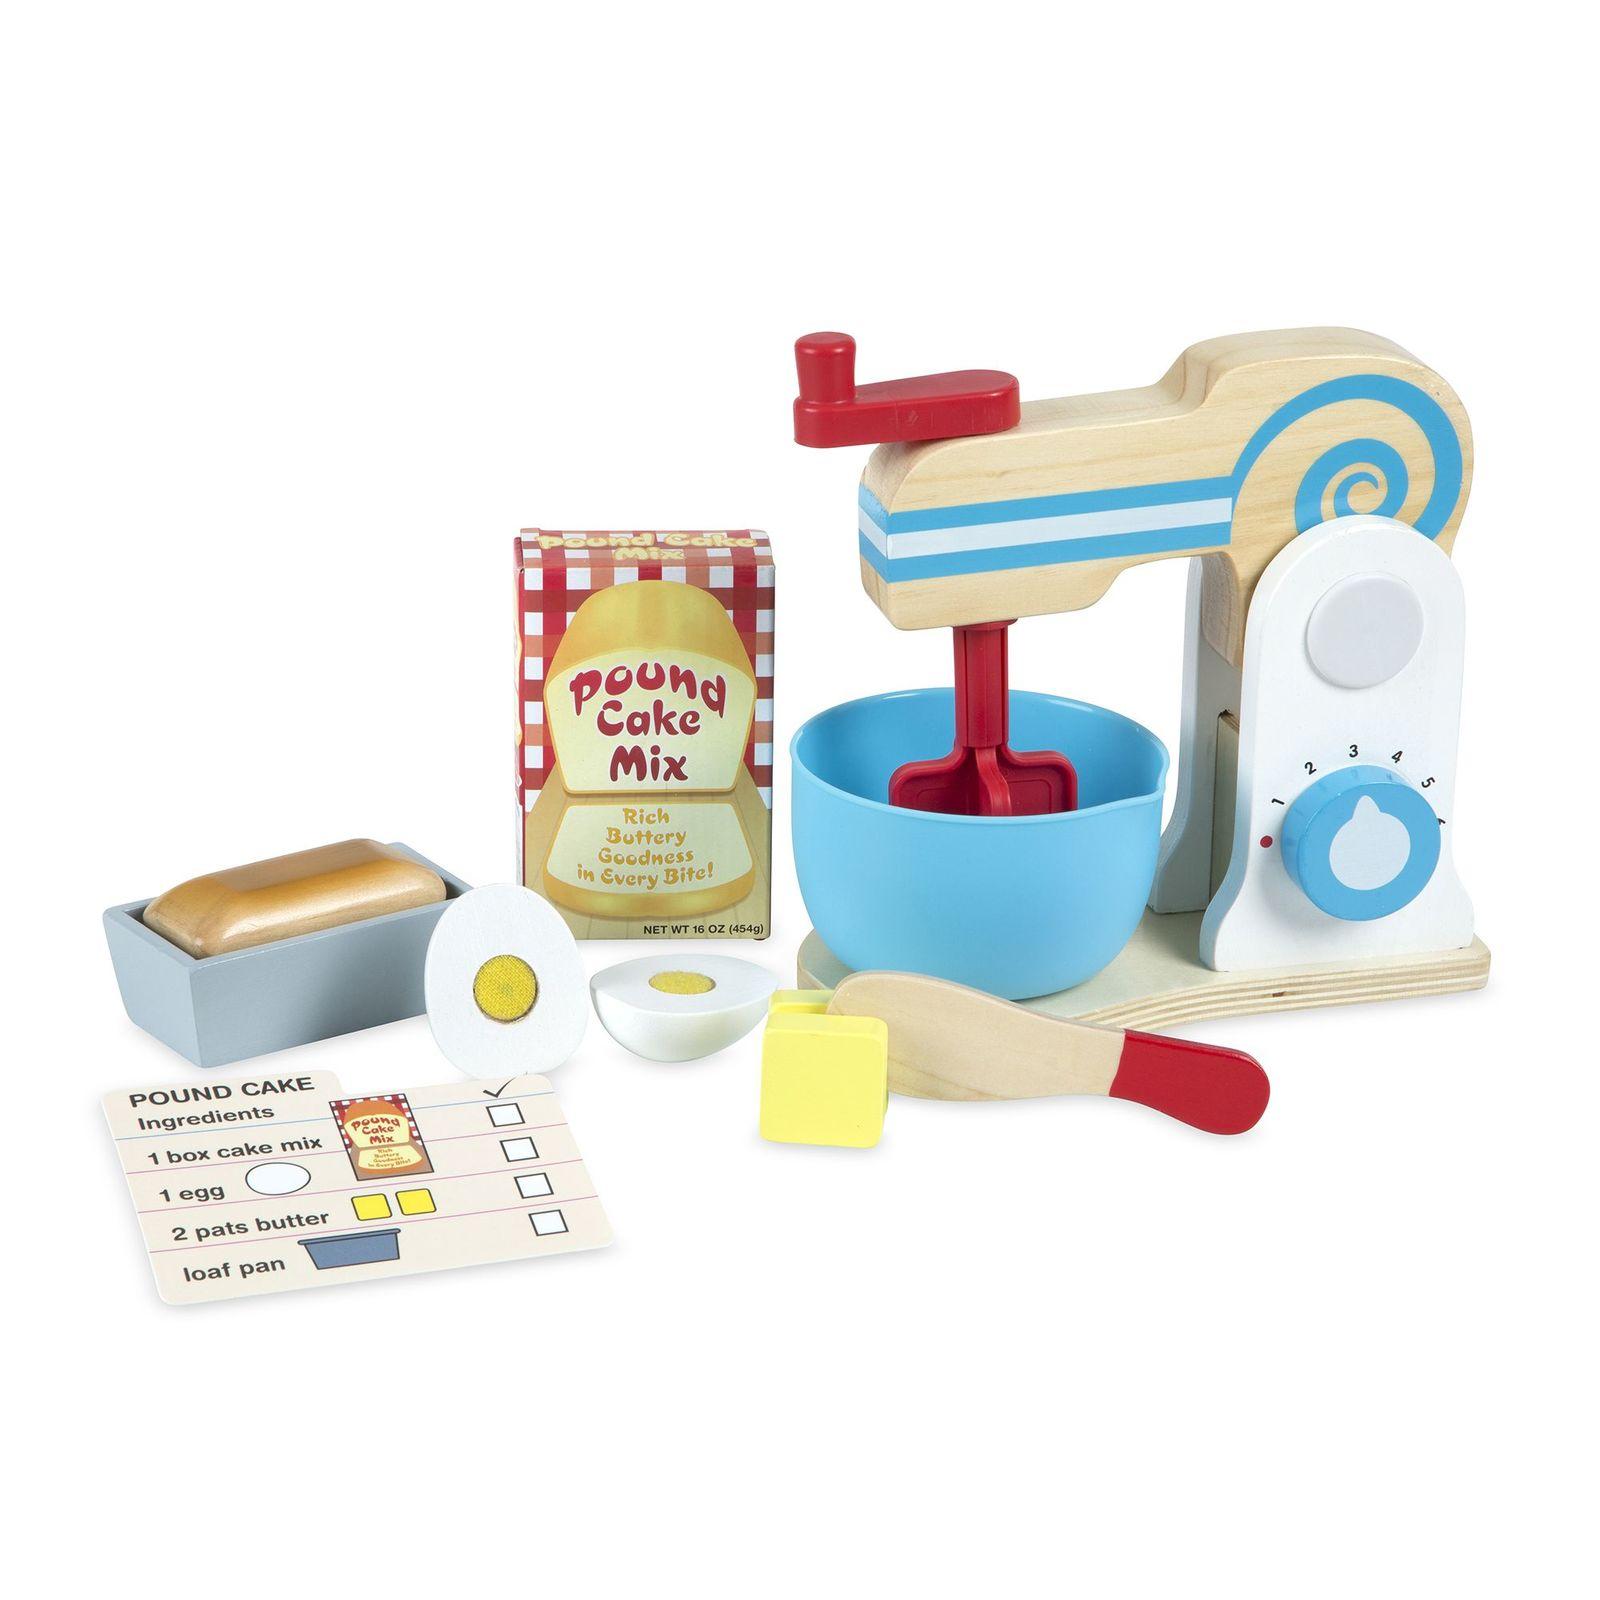 Melissa & Doug Wooden Make-a-Cake Mixer Set - $33.16